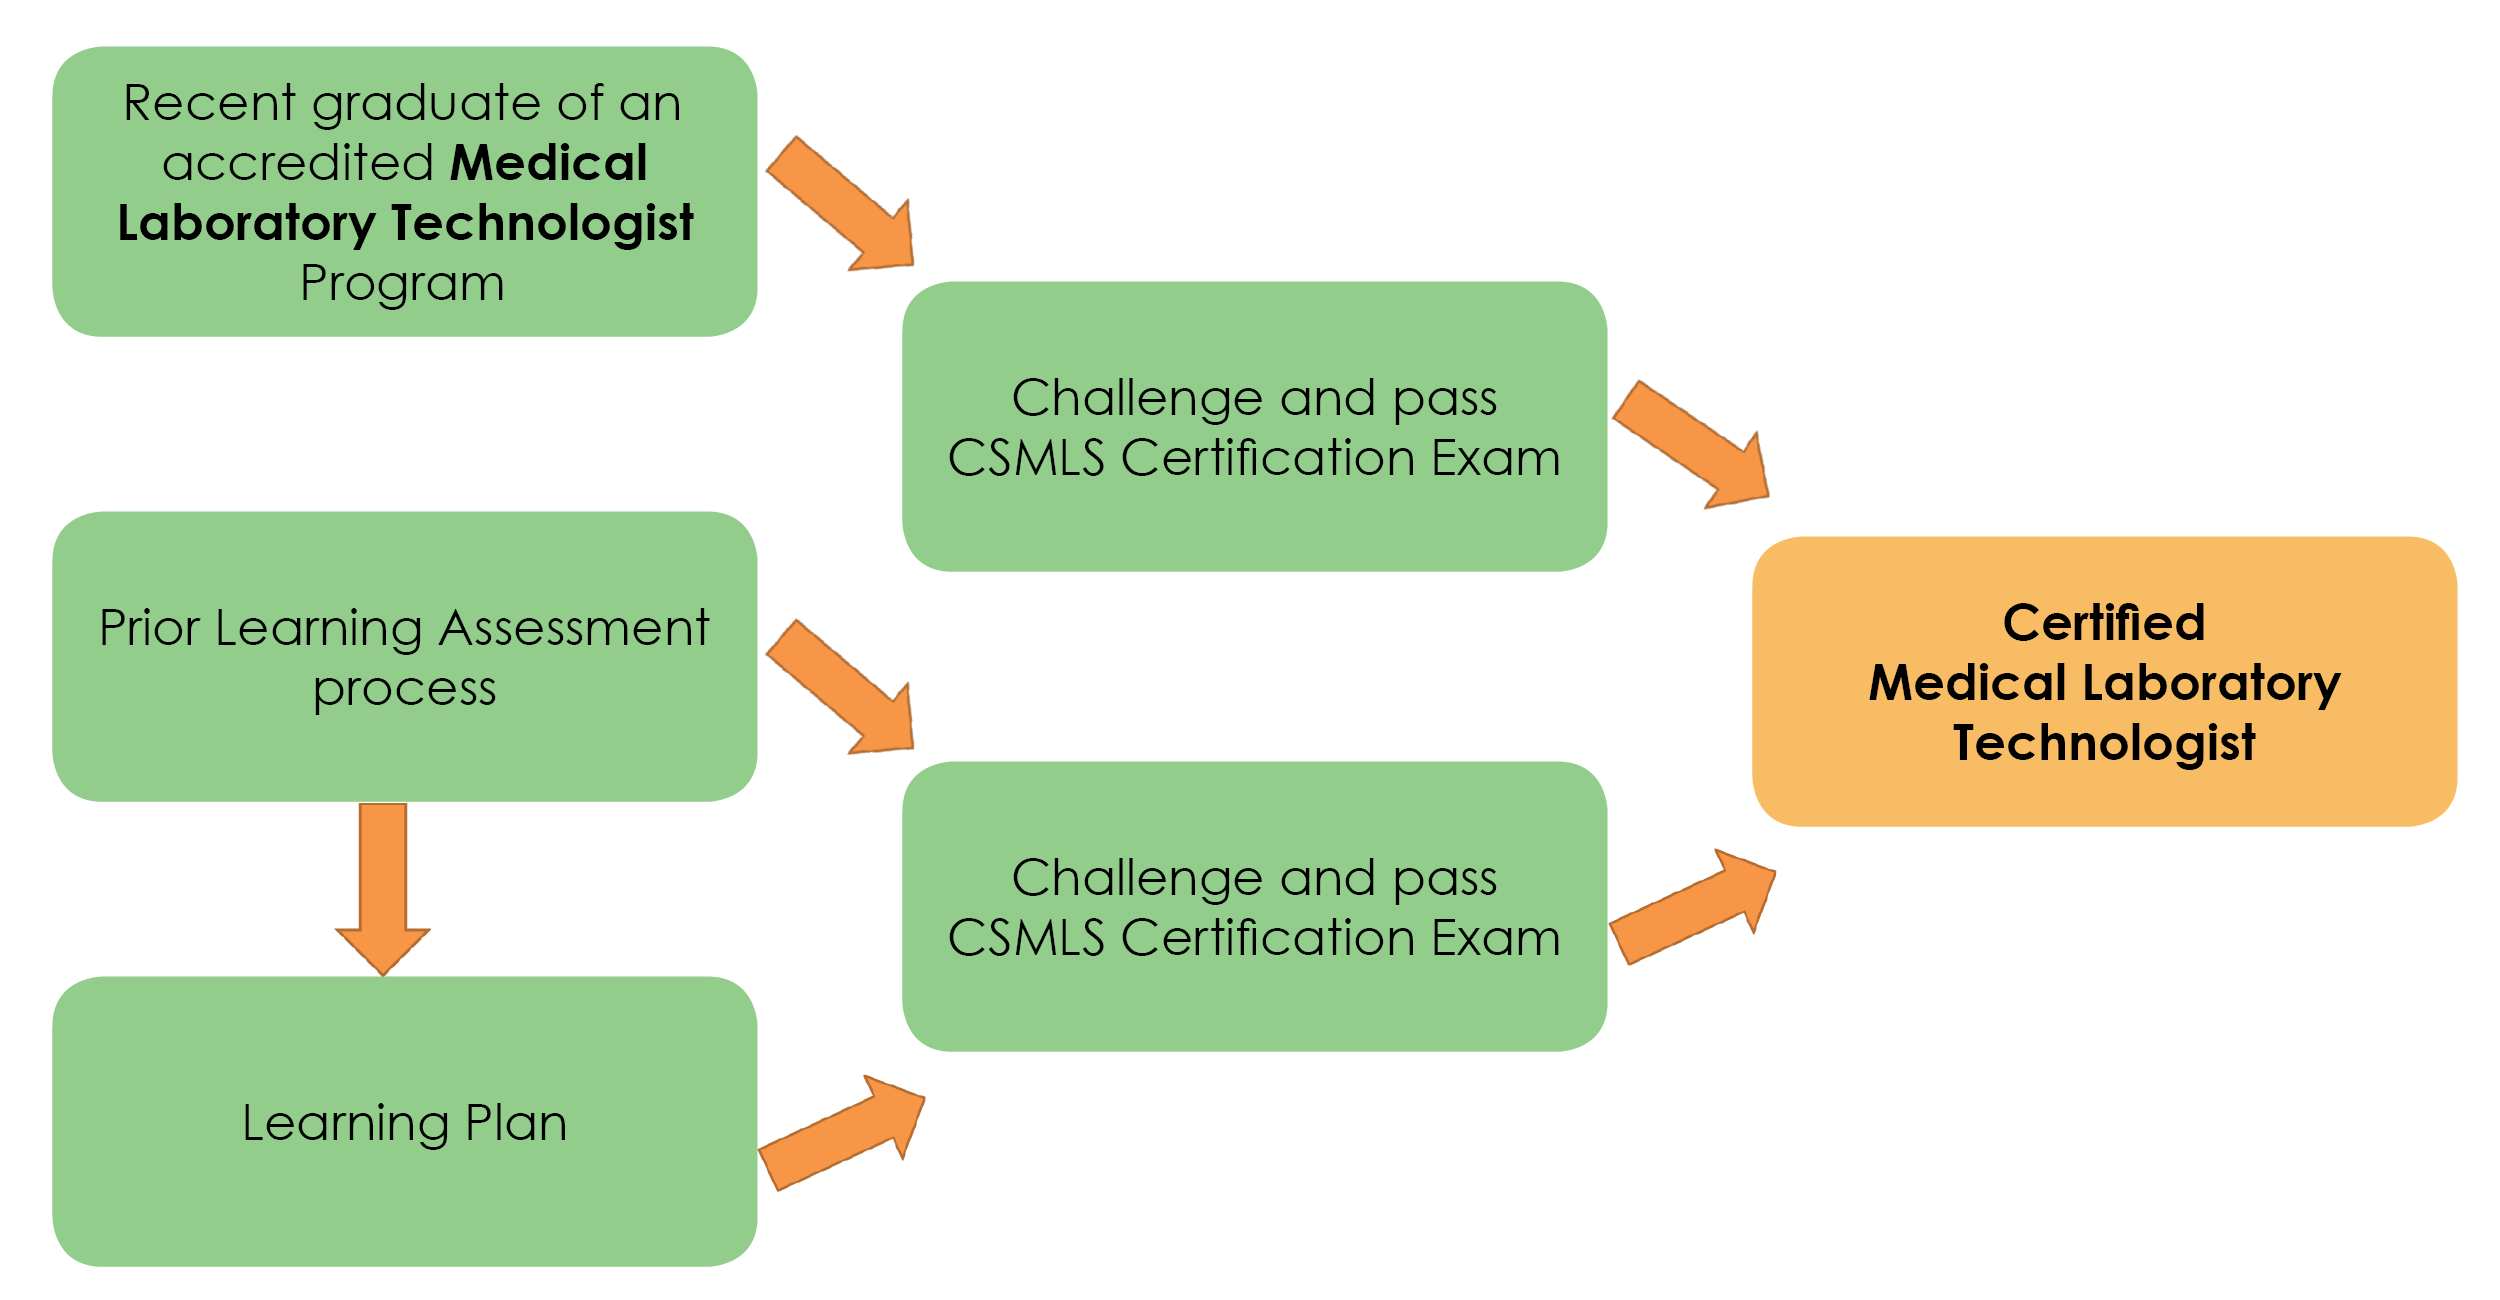 Csmls Scslm Medical Laboratory Technology